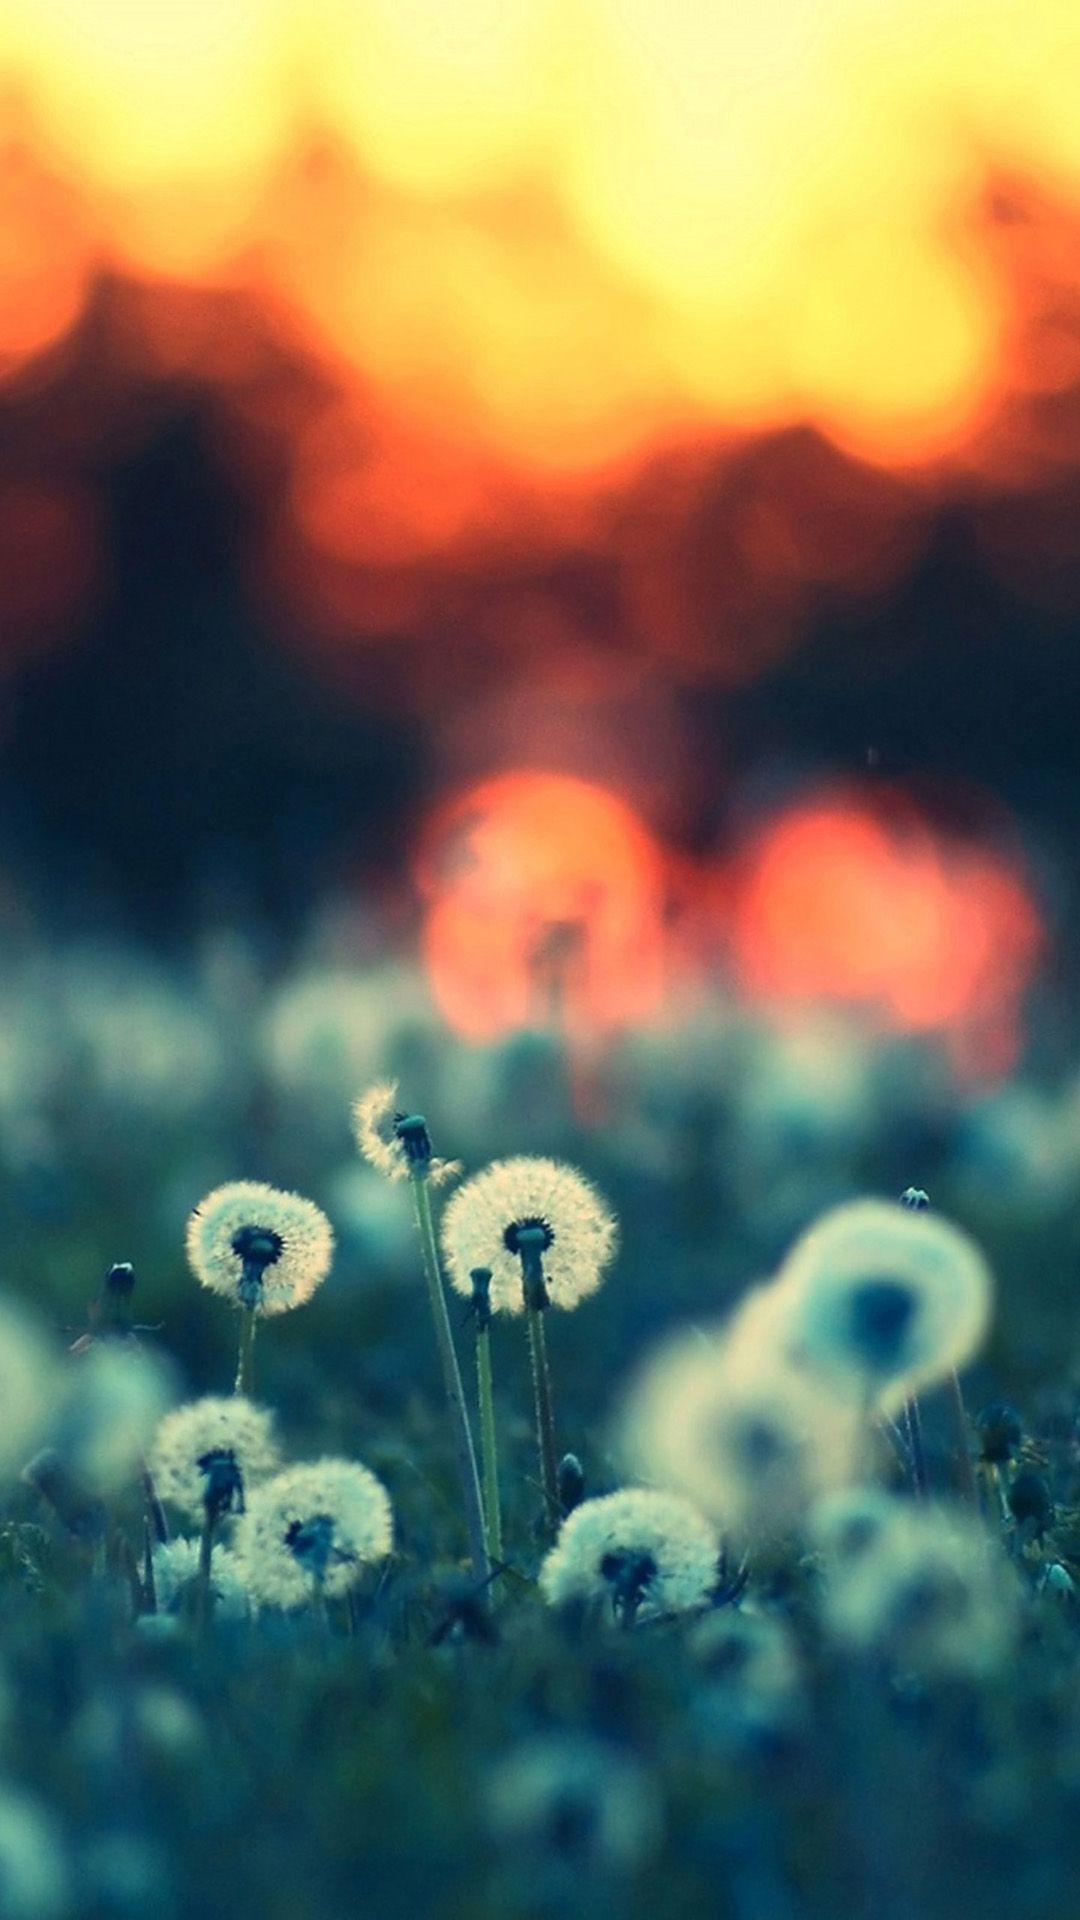 Iphone 5 wallpaper tumblr photography - Samsung Galaxy S5 Wallpapers Sunset 6 Jpg 1080